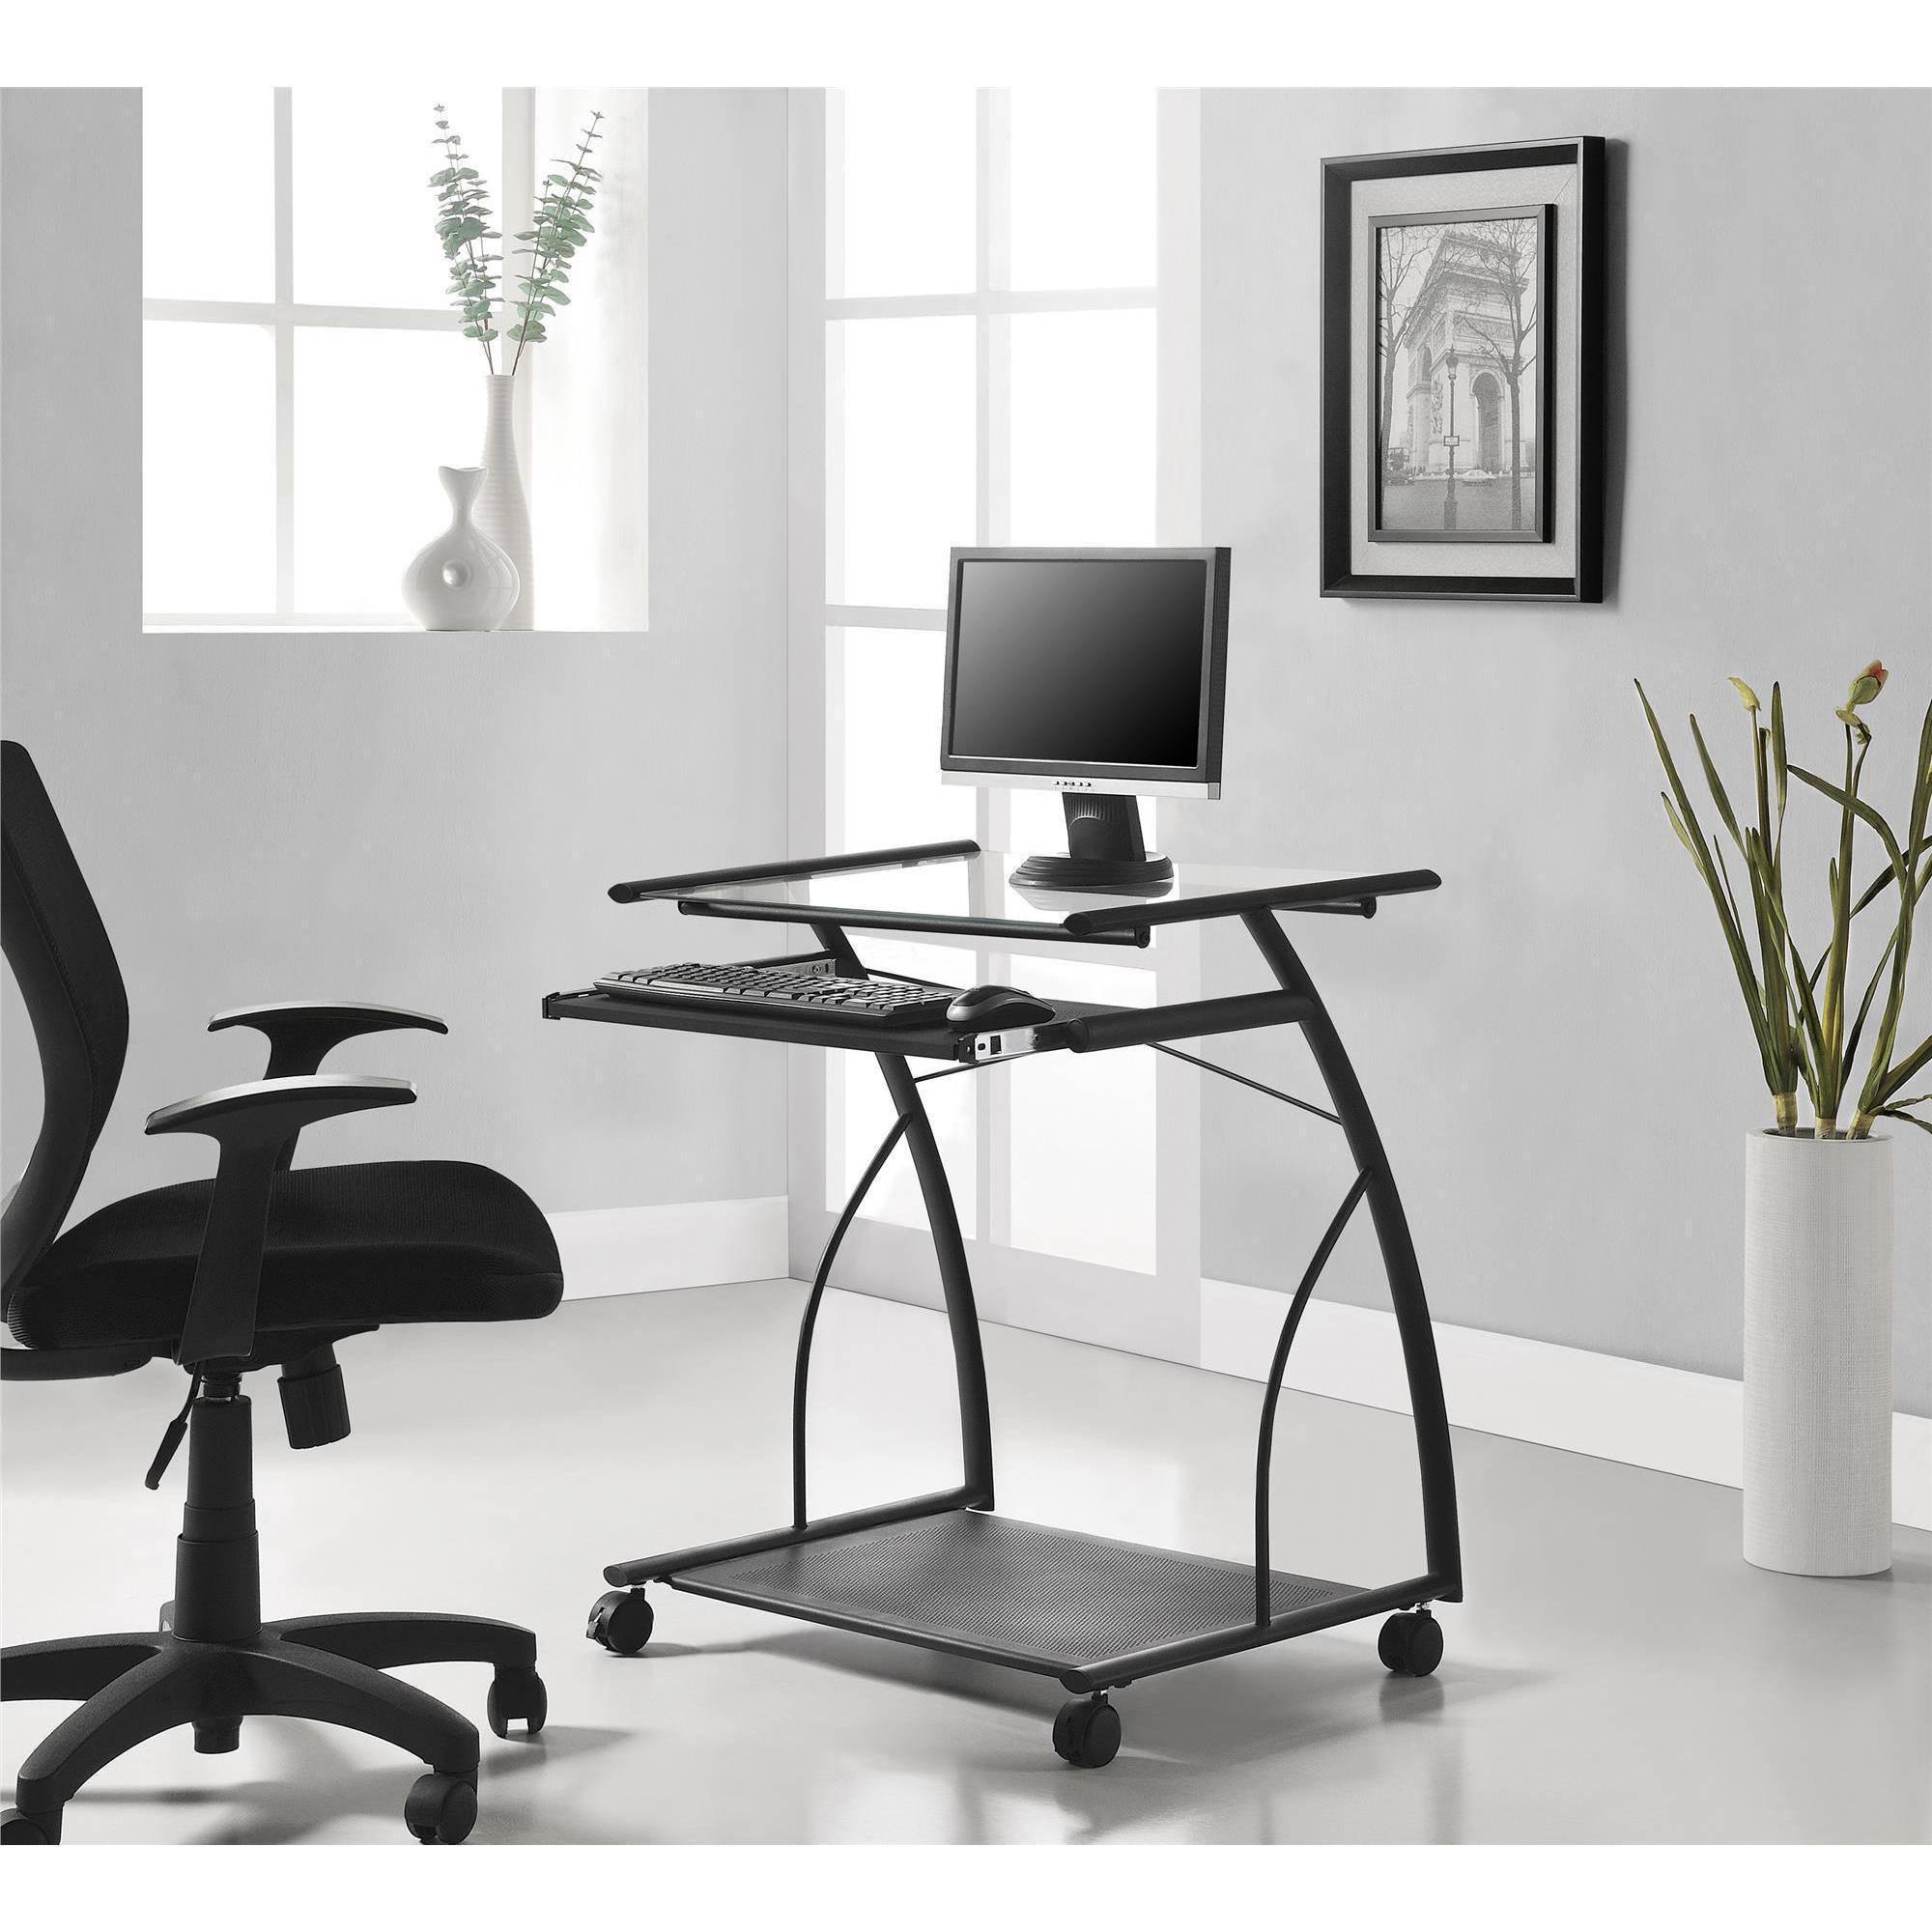 Altra Furniture Mobile puter Cart Desk Black Walmart